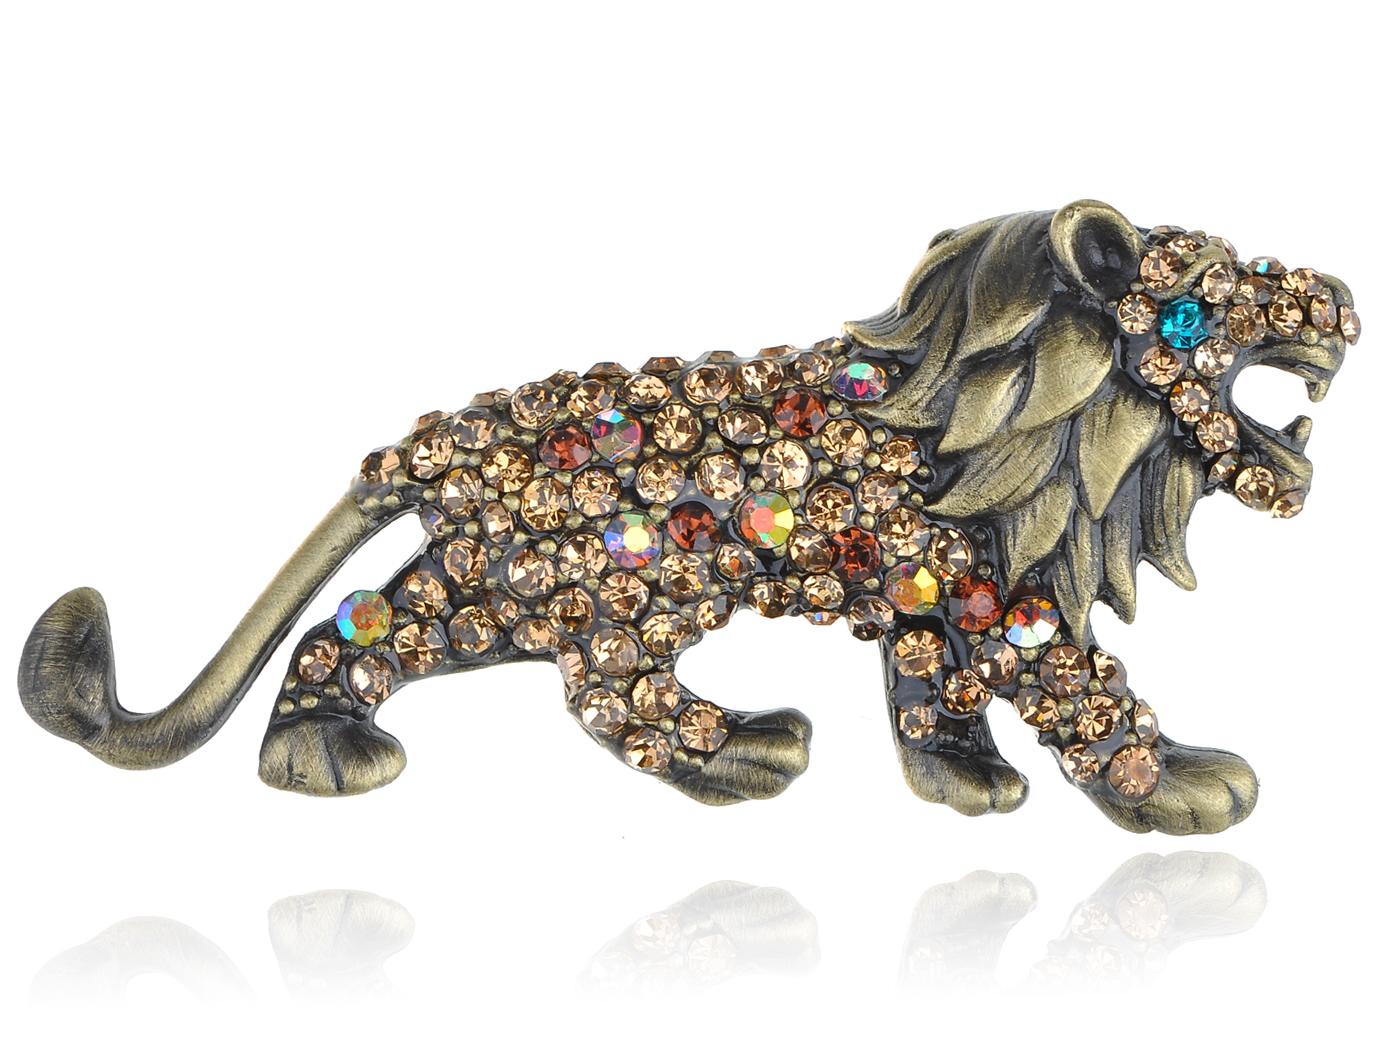 Geunine Topaz Crystal Rhinestone Roaring King Lion Animal Fashion Pin Brooch by